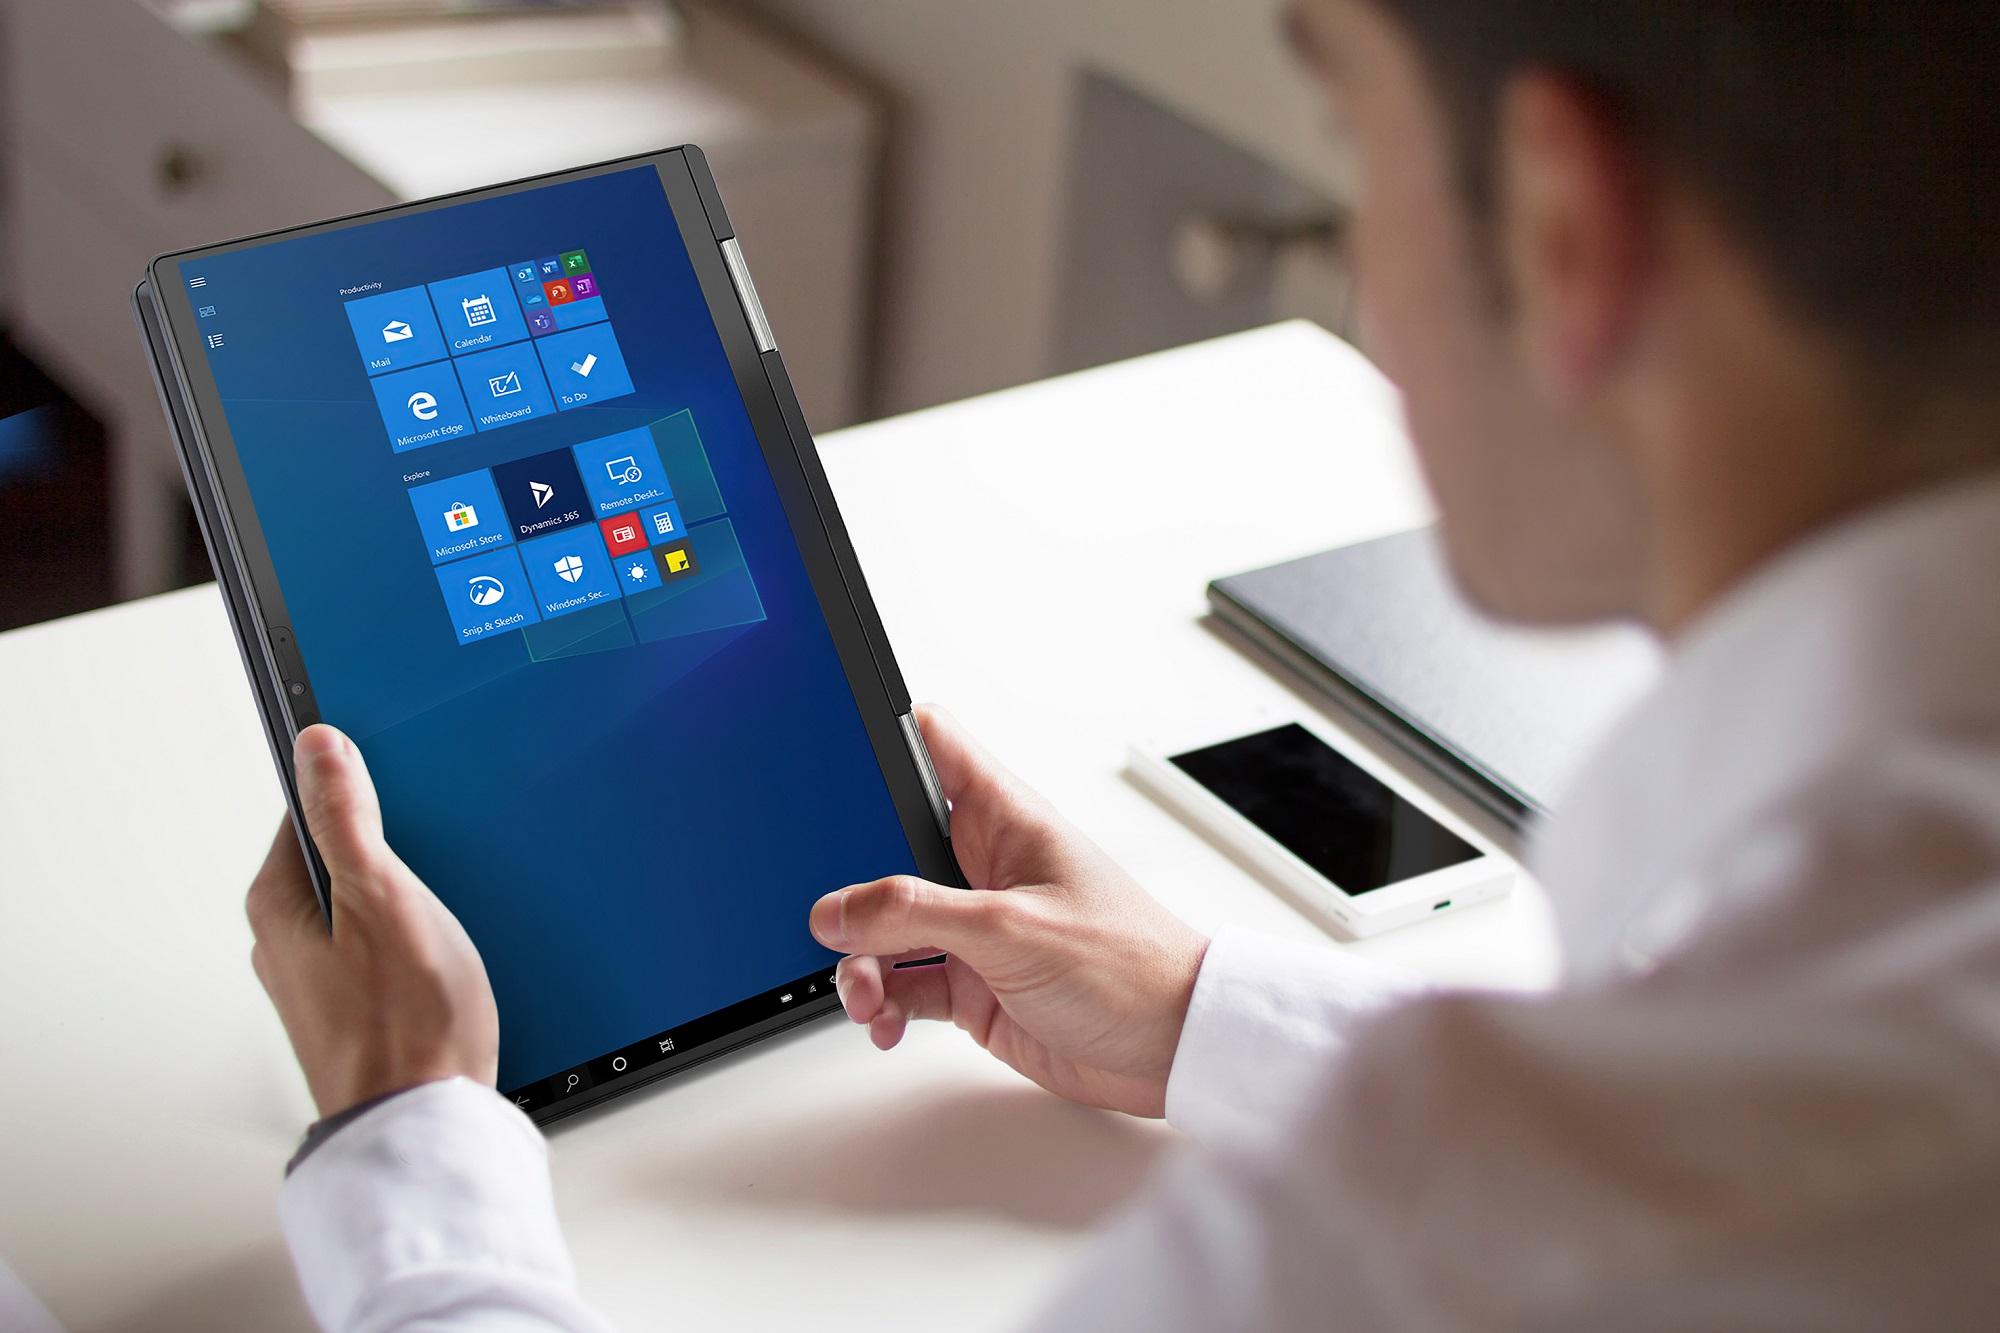 x30w j 2 เปิดตัว Dynabook Portégé X30W J แล็ปท็อปไฮบริด 13 นิ้ว เบาที่สุดในโลก มาพร้อม Intel® Core™ เจนเนอเรชั่น 11 และได้รับรองสมรรถนะ Intel® Evo™ เบาเพียง 989 กรัม พิสูจน์ความเป็นเลิศด้านวิสัยทัศน์การออกแบบคอมพิวเตอร์พกพาของ Dynabook